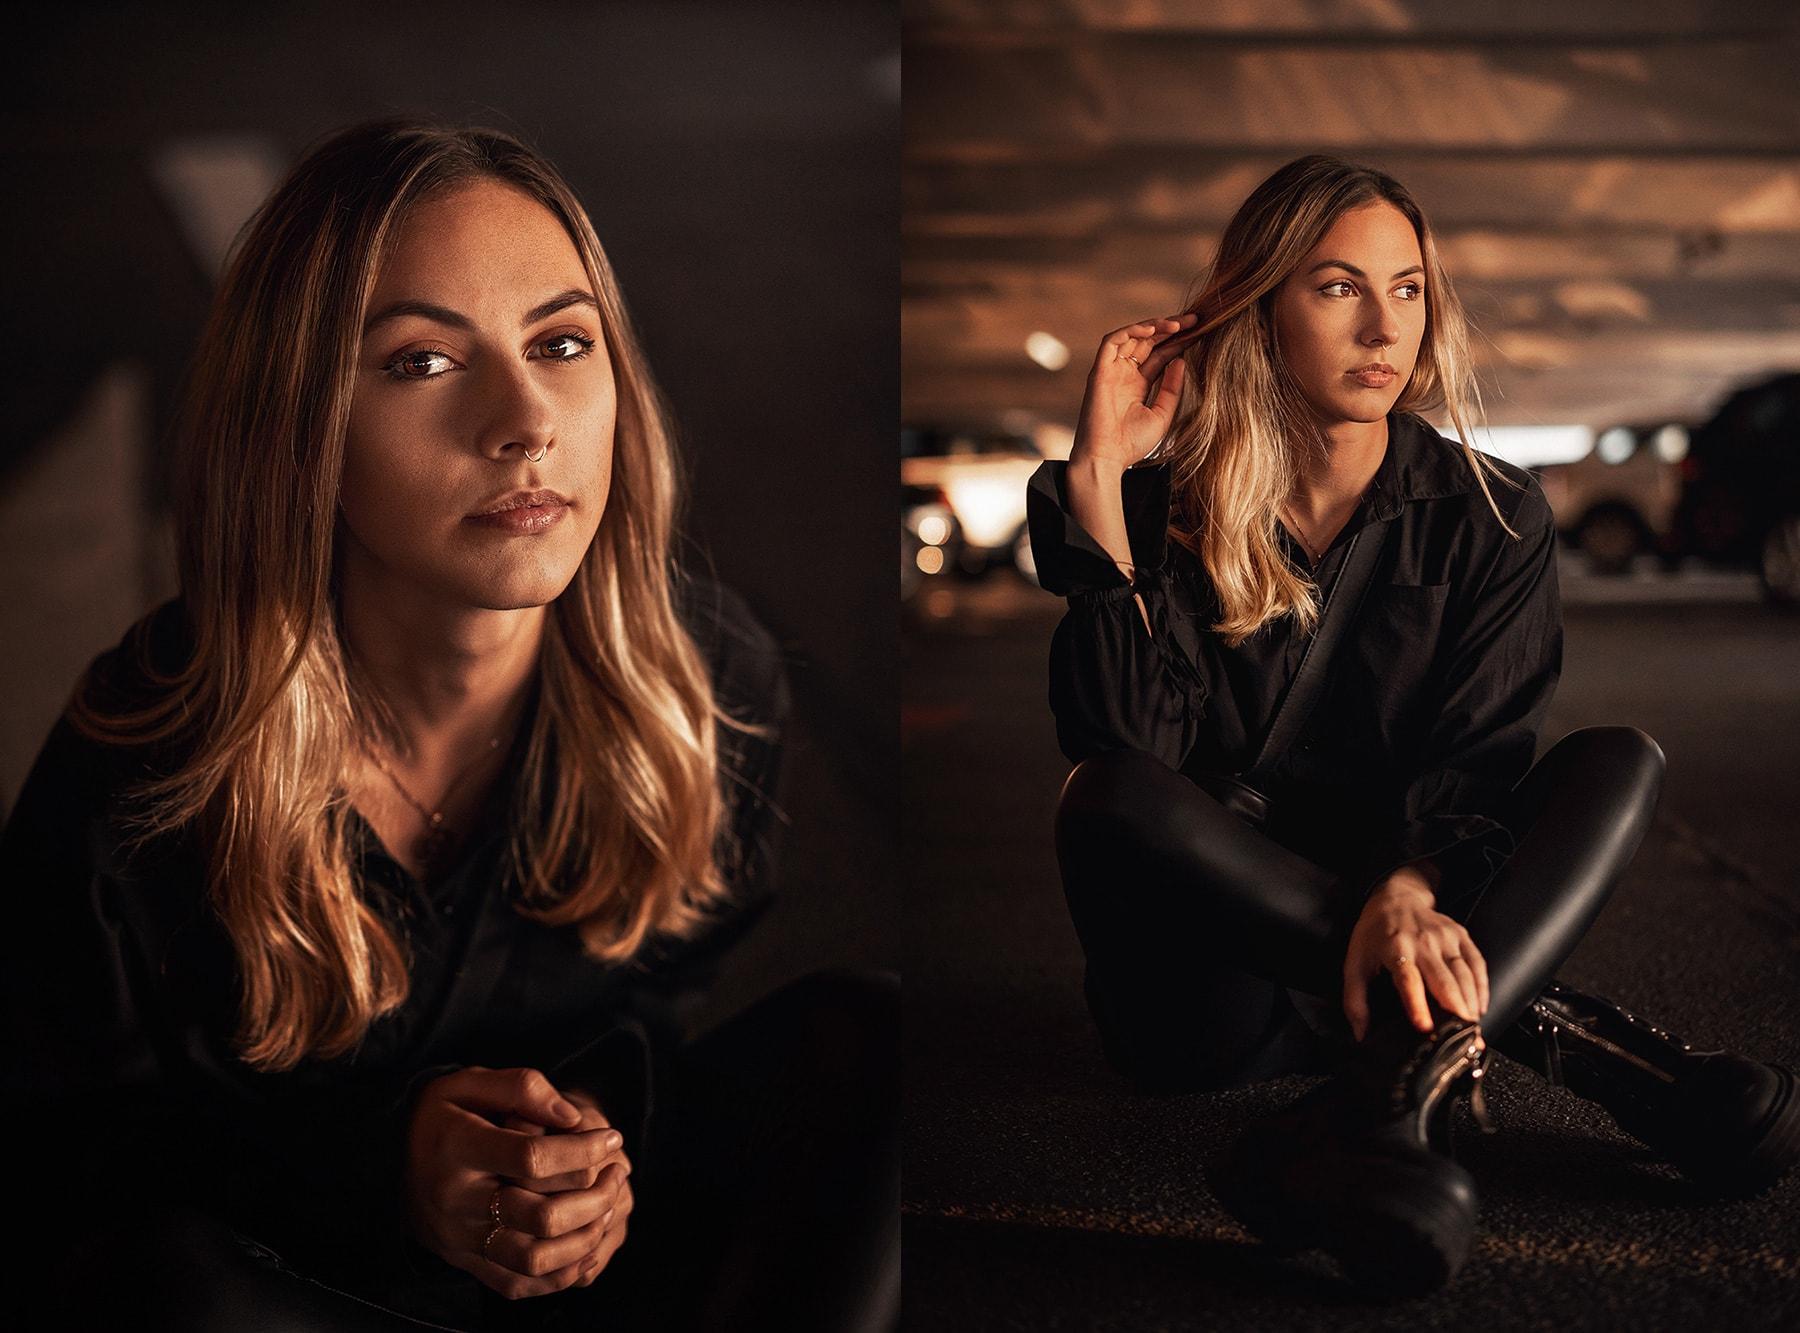 Daniela - Portraitshooting in Hannover